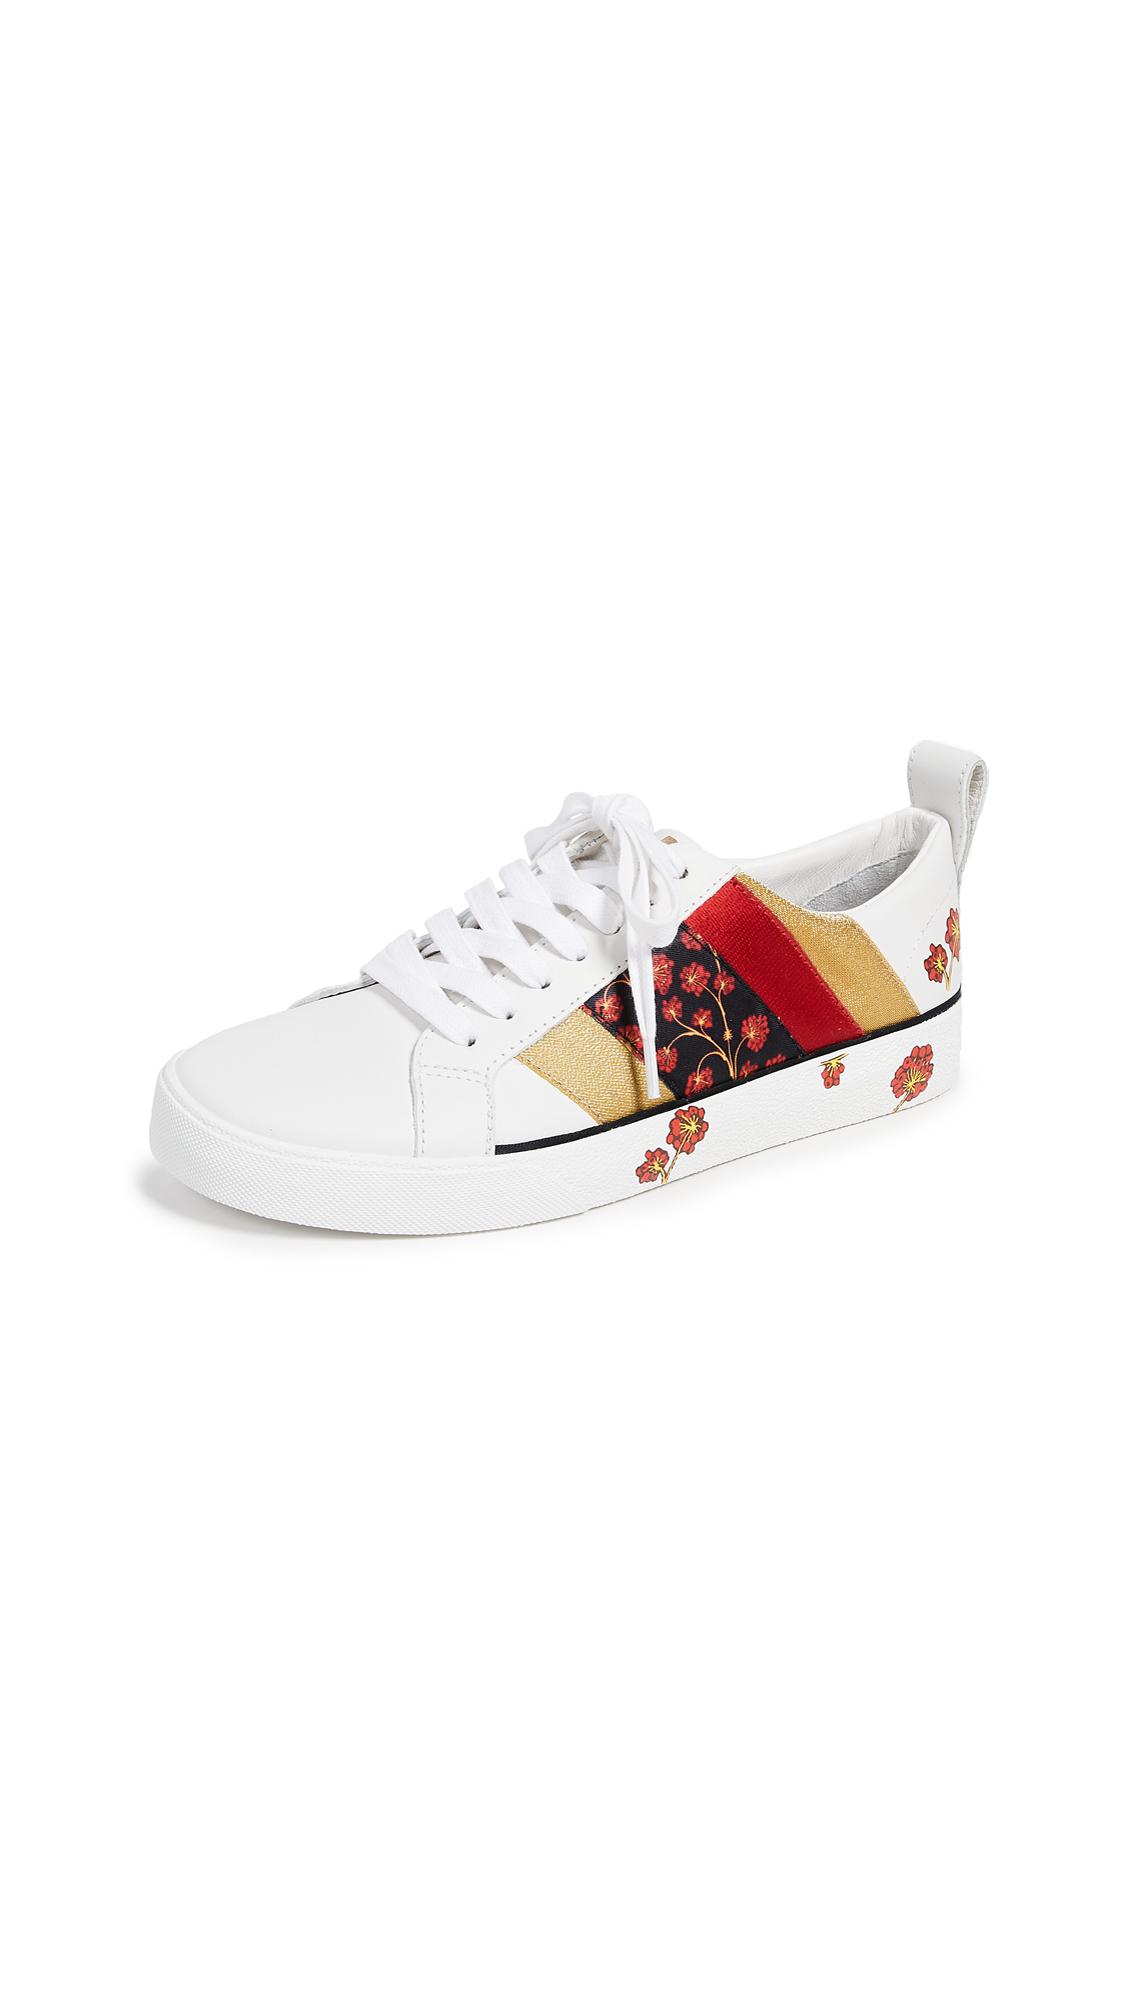 Diane von Furstenberg Tess 9 Sneakers - White/Red